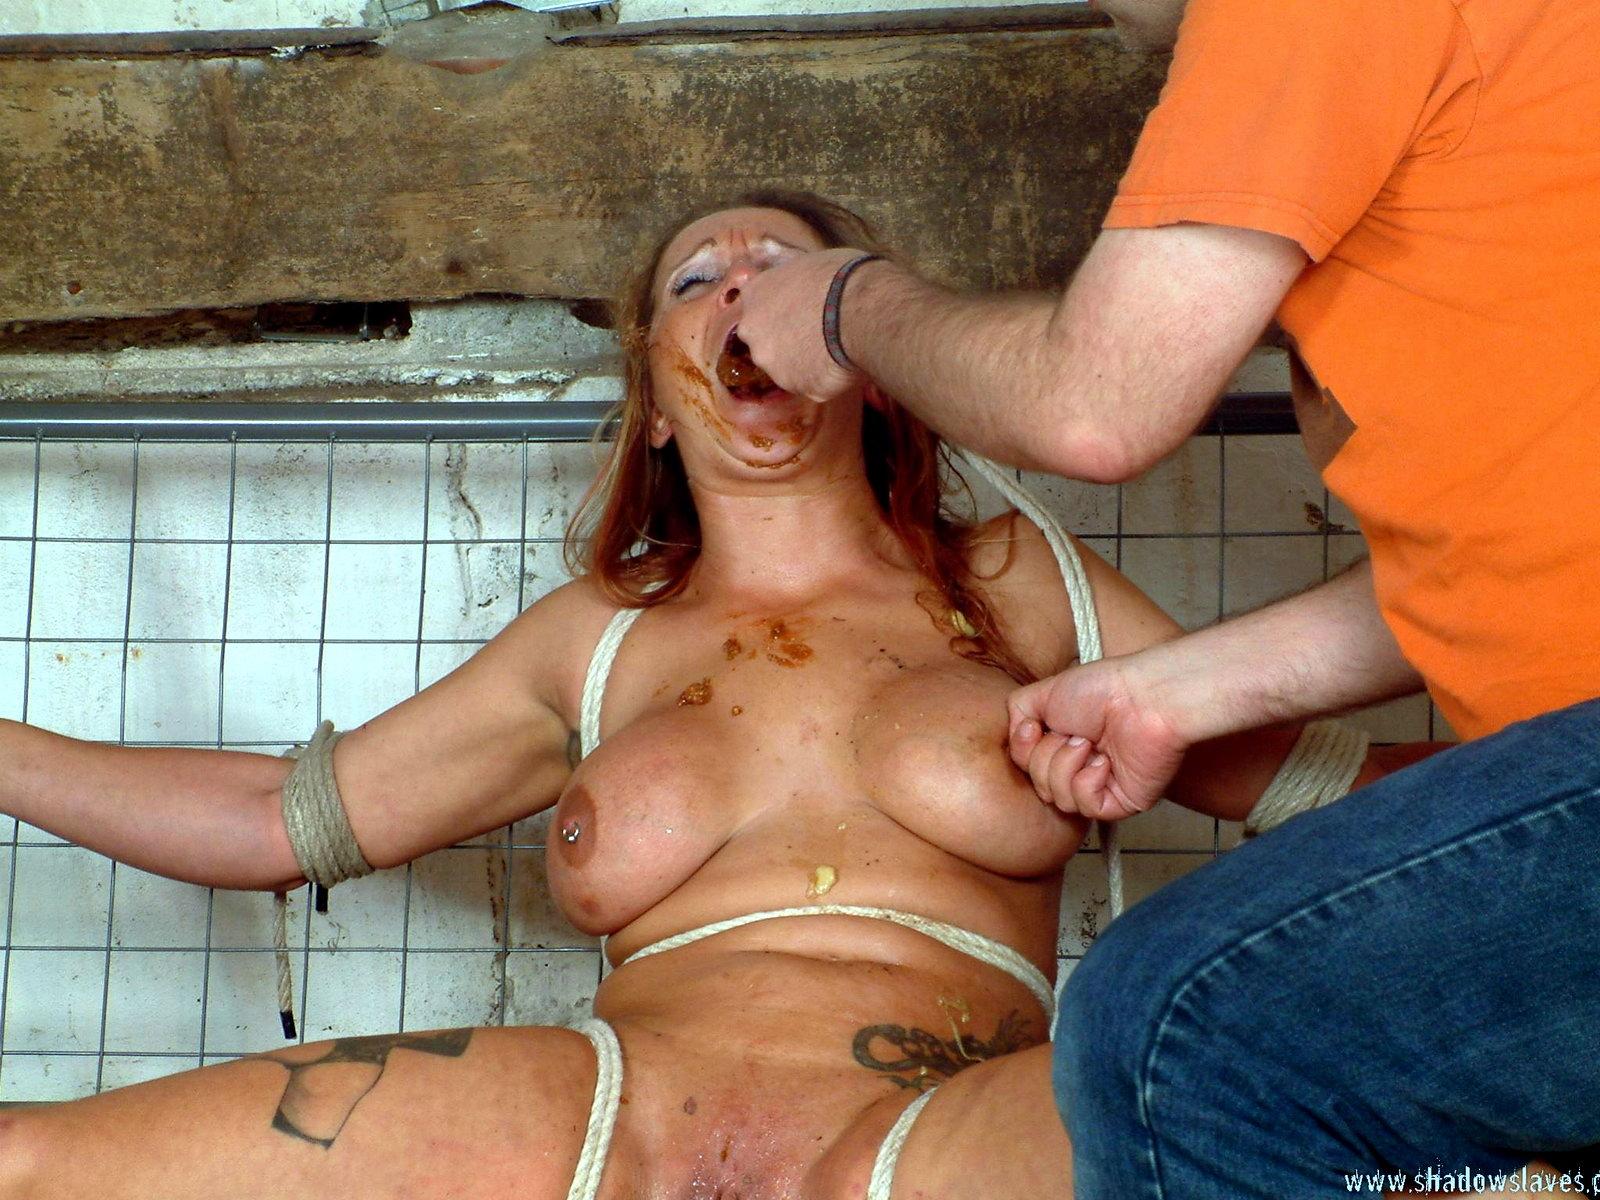 Sick taboo good free porn